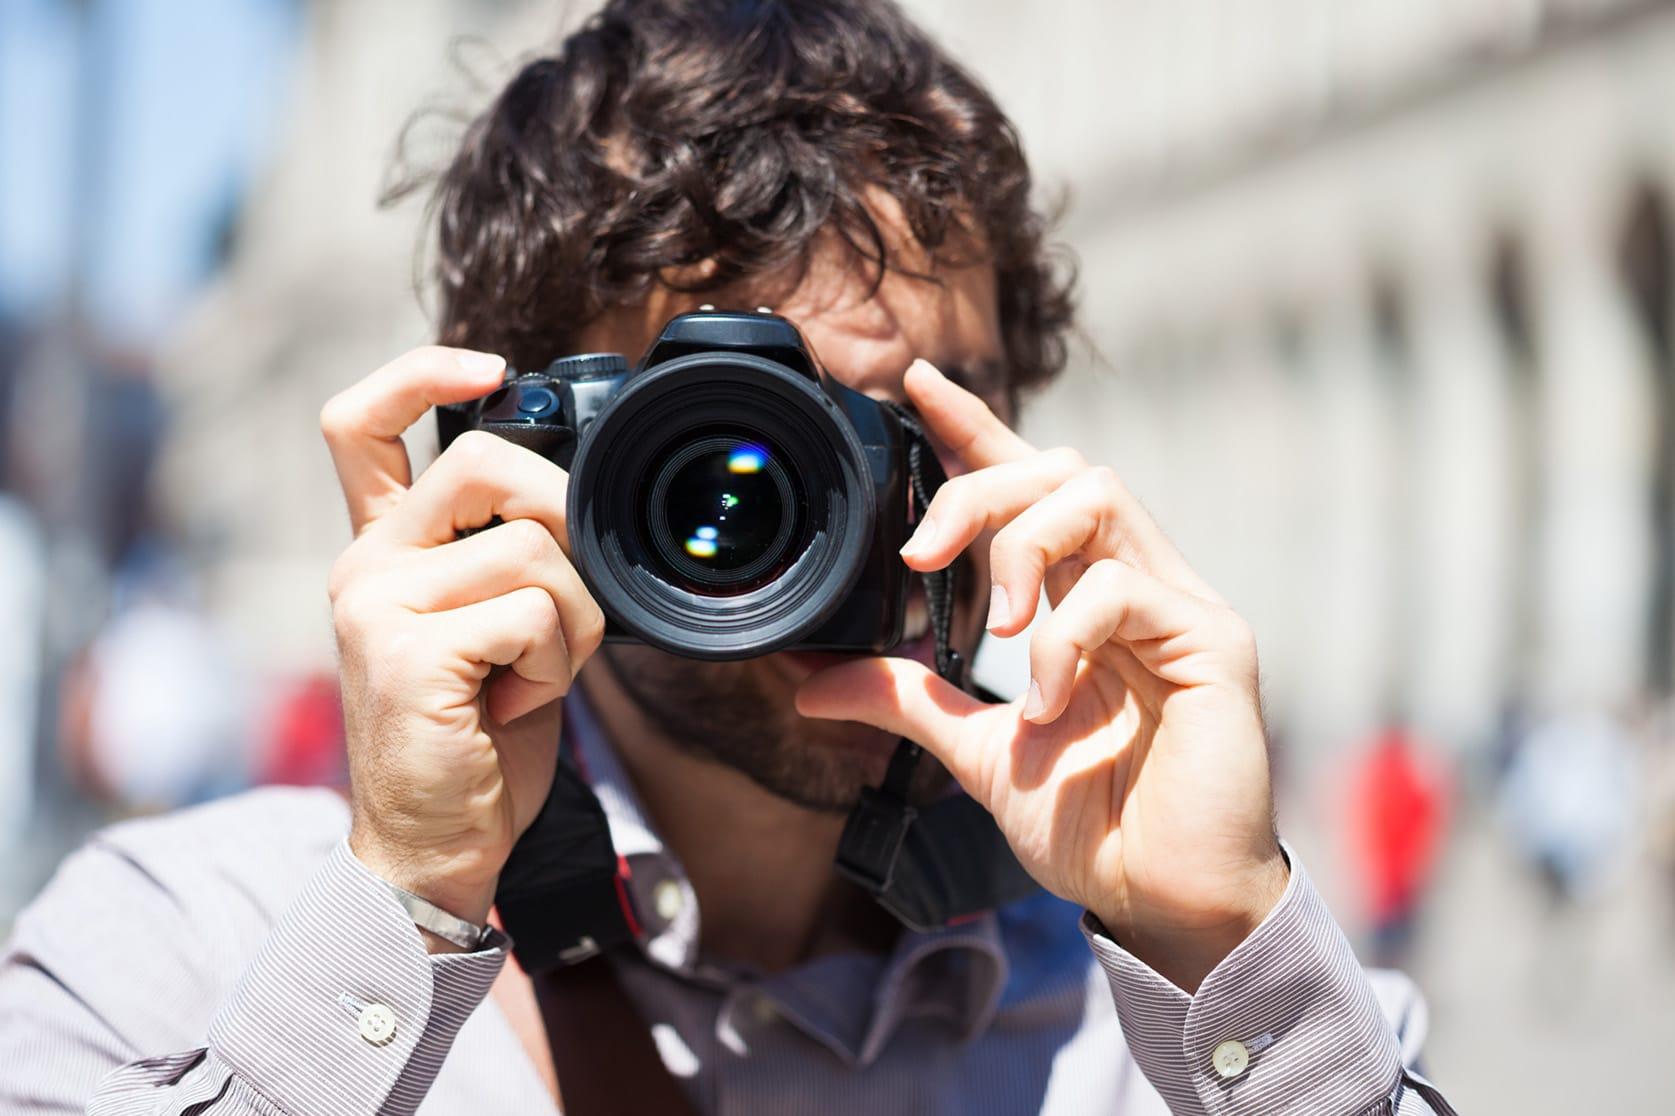 Man shooting photograph